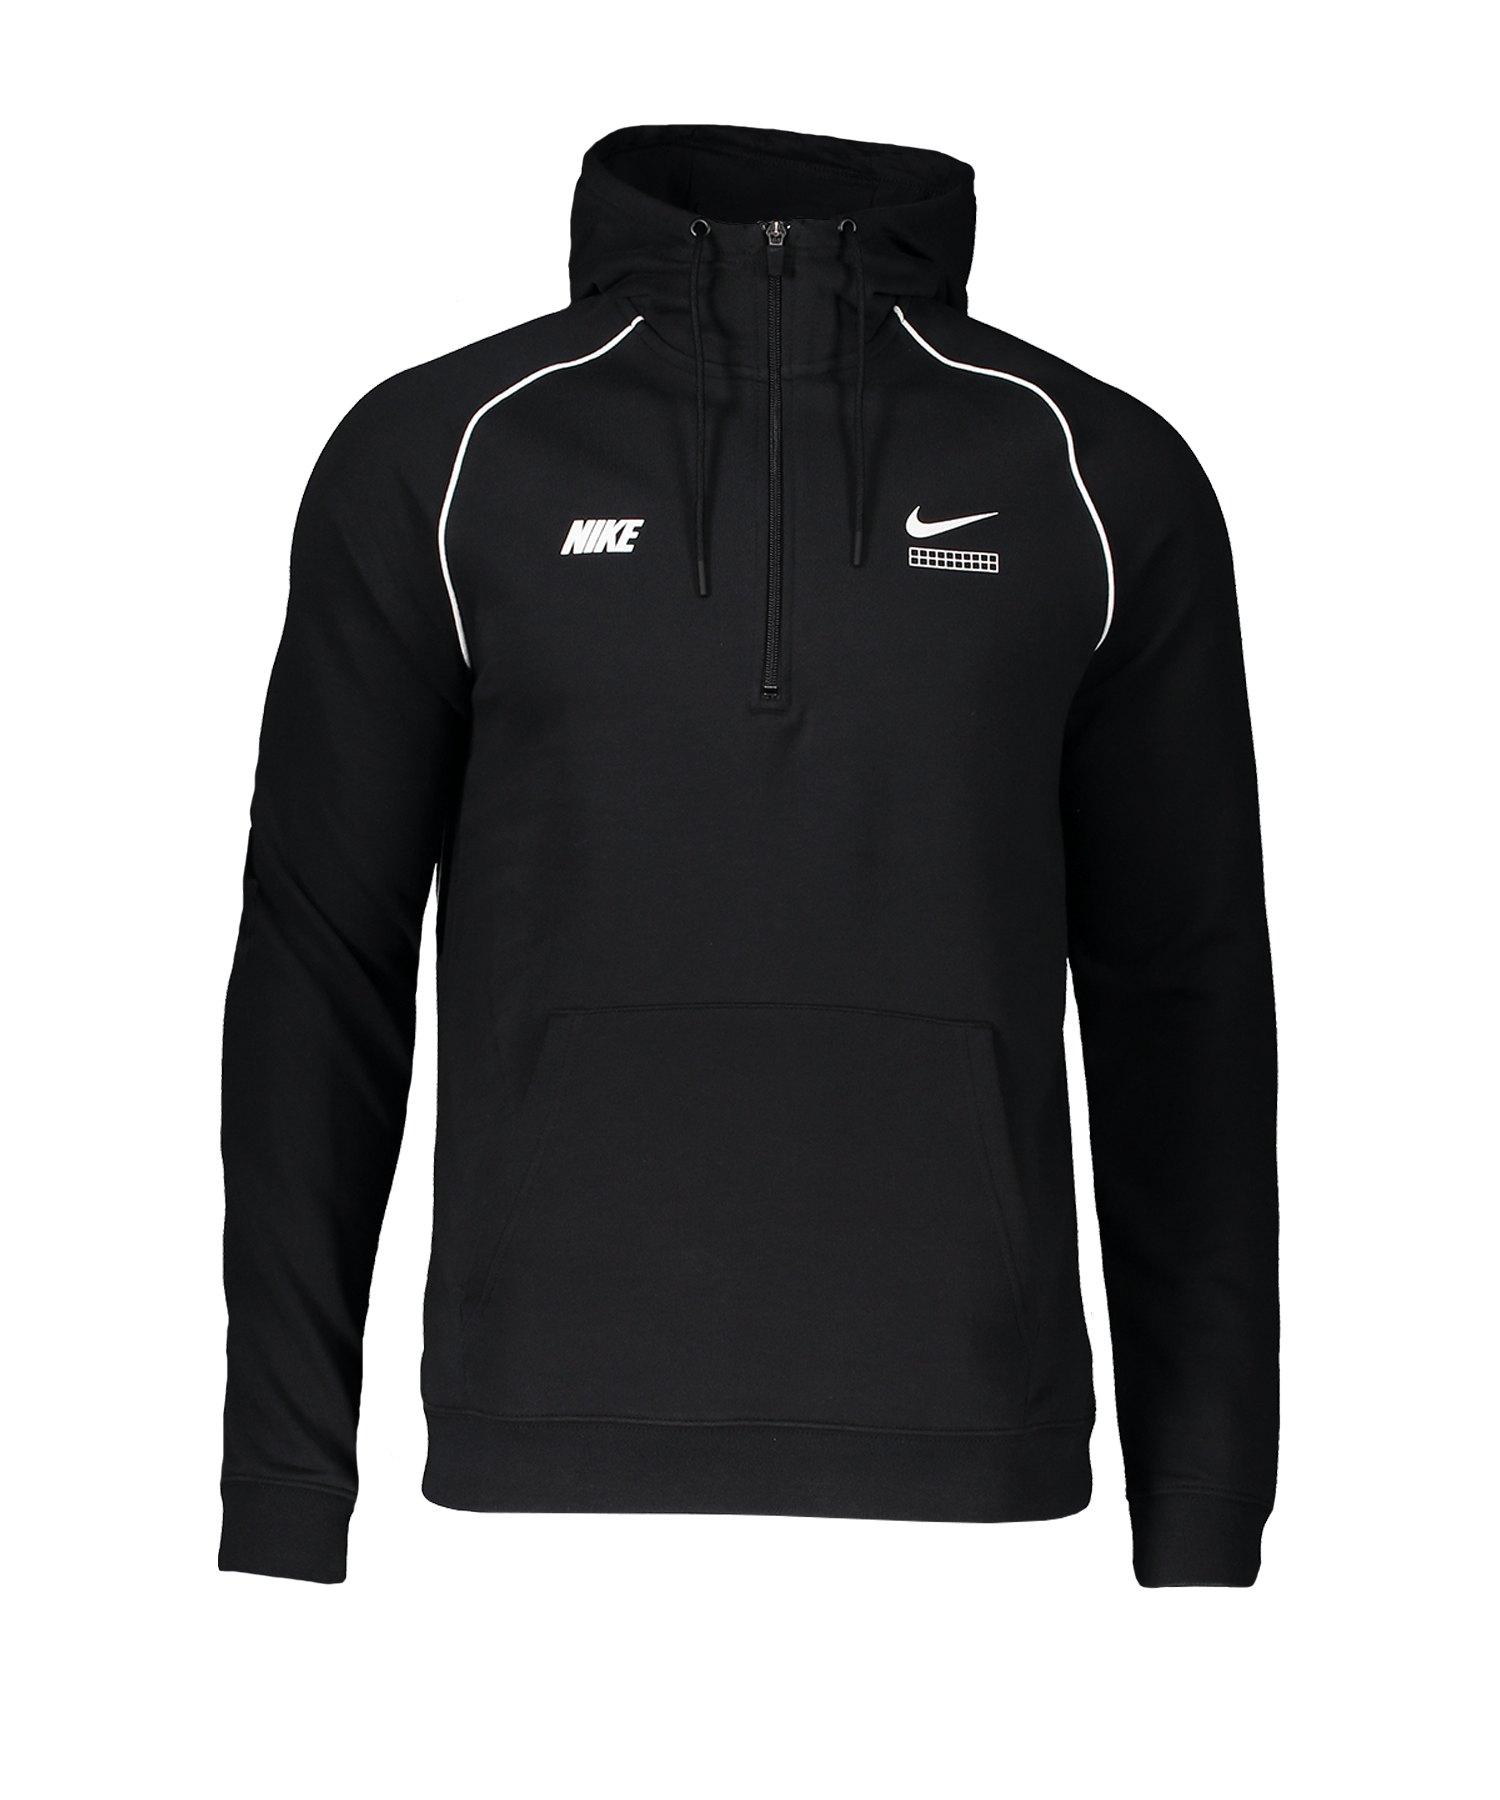 Nike DNA Hoody Kapuzenpullover Schwarz F010 - schwarz